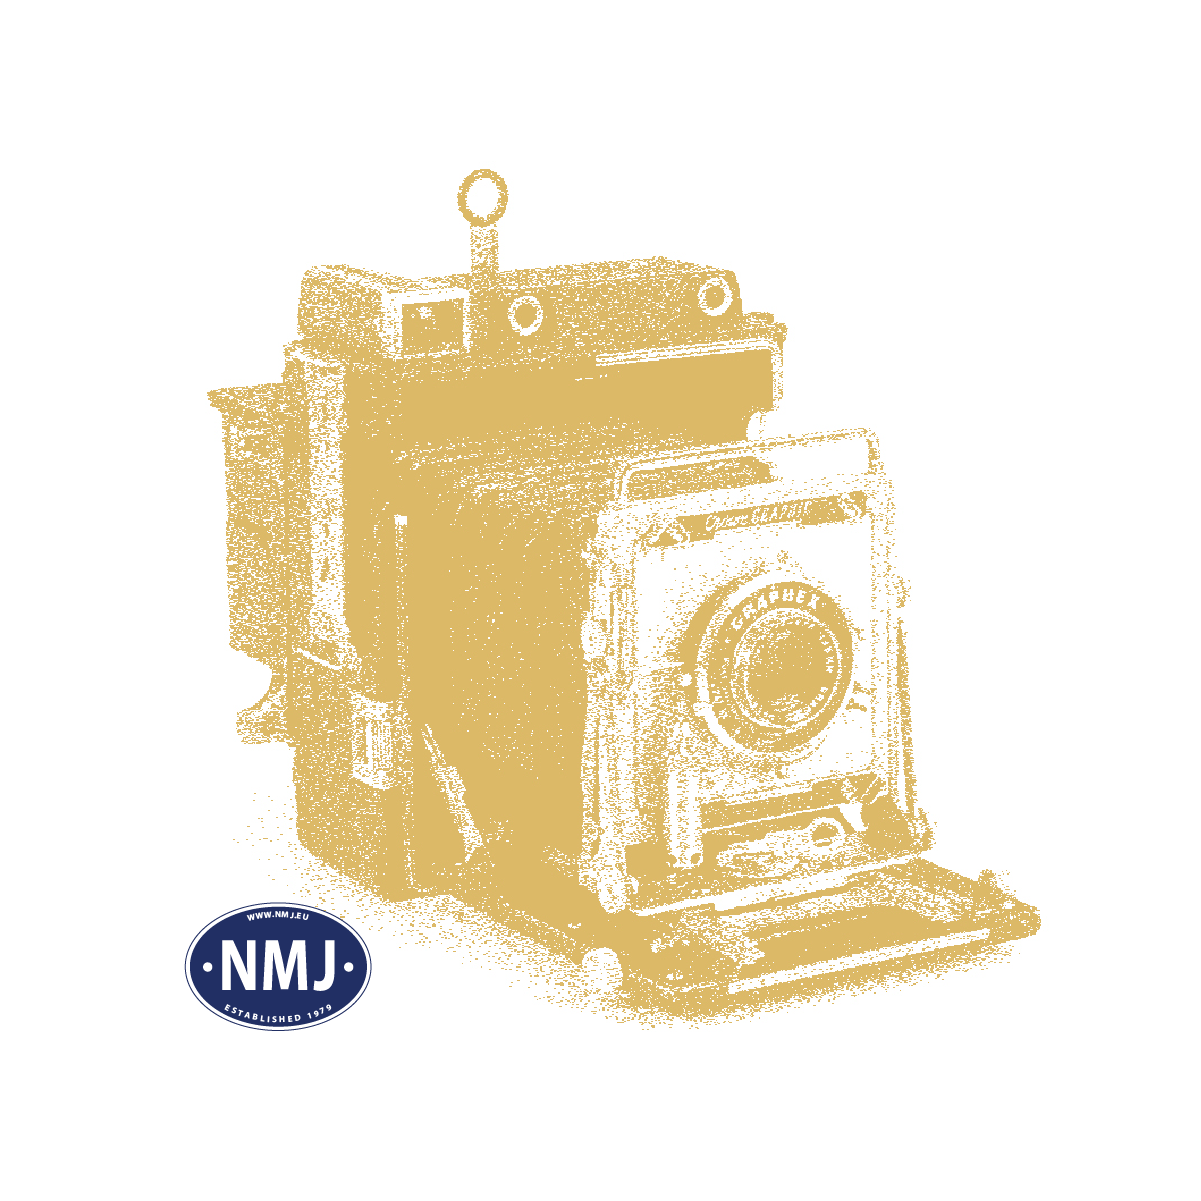 NMJT90103 - NMJ Topline DSB MY 1148, Nohab, DC